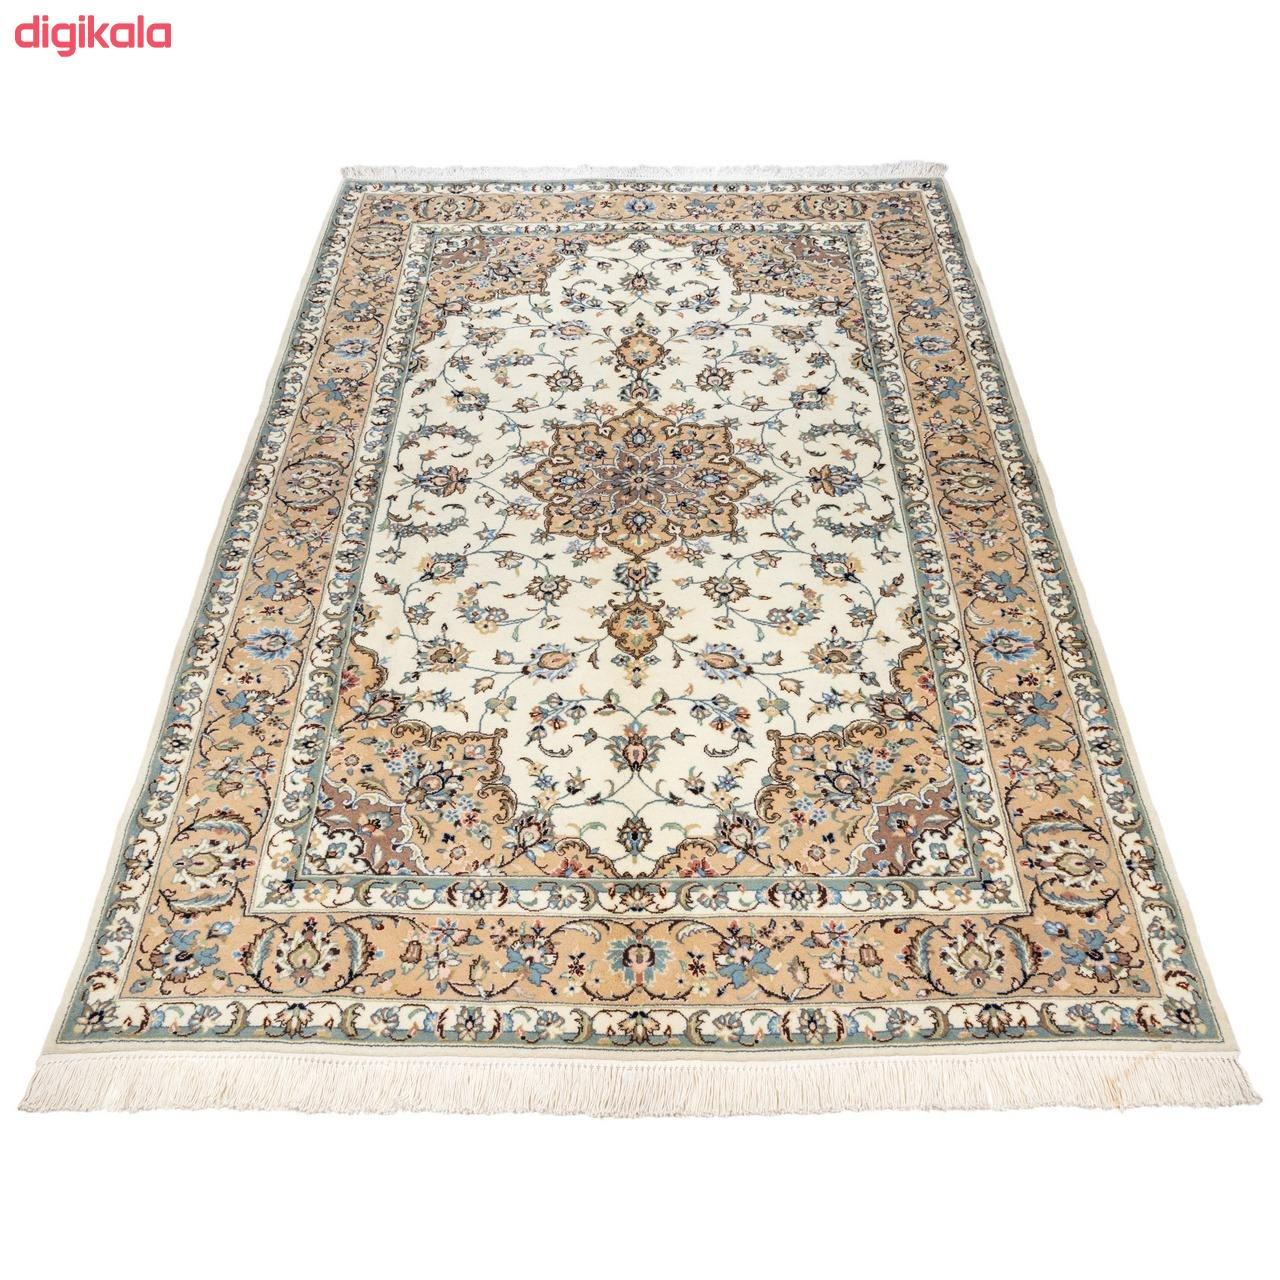 فرش دستباف پنج و نیم متری سی پرشیا کد 174334